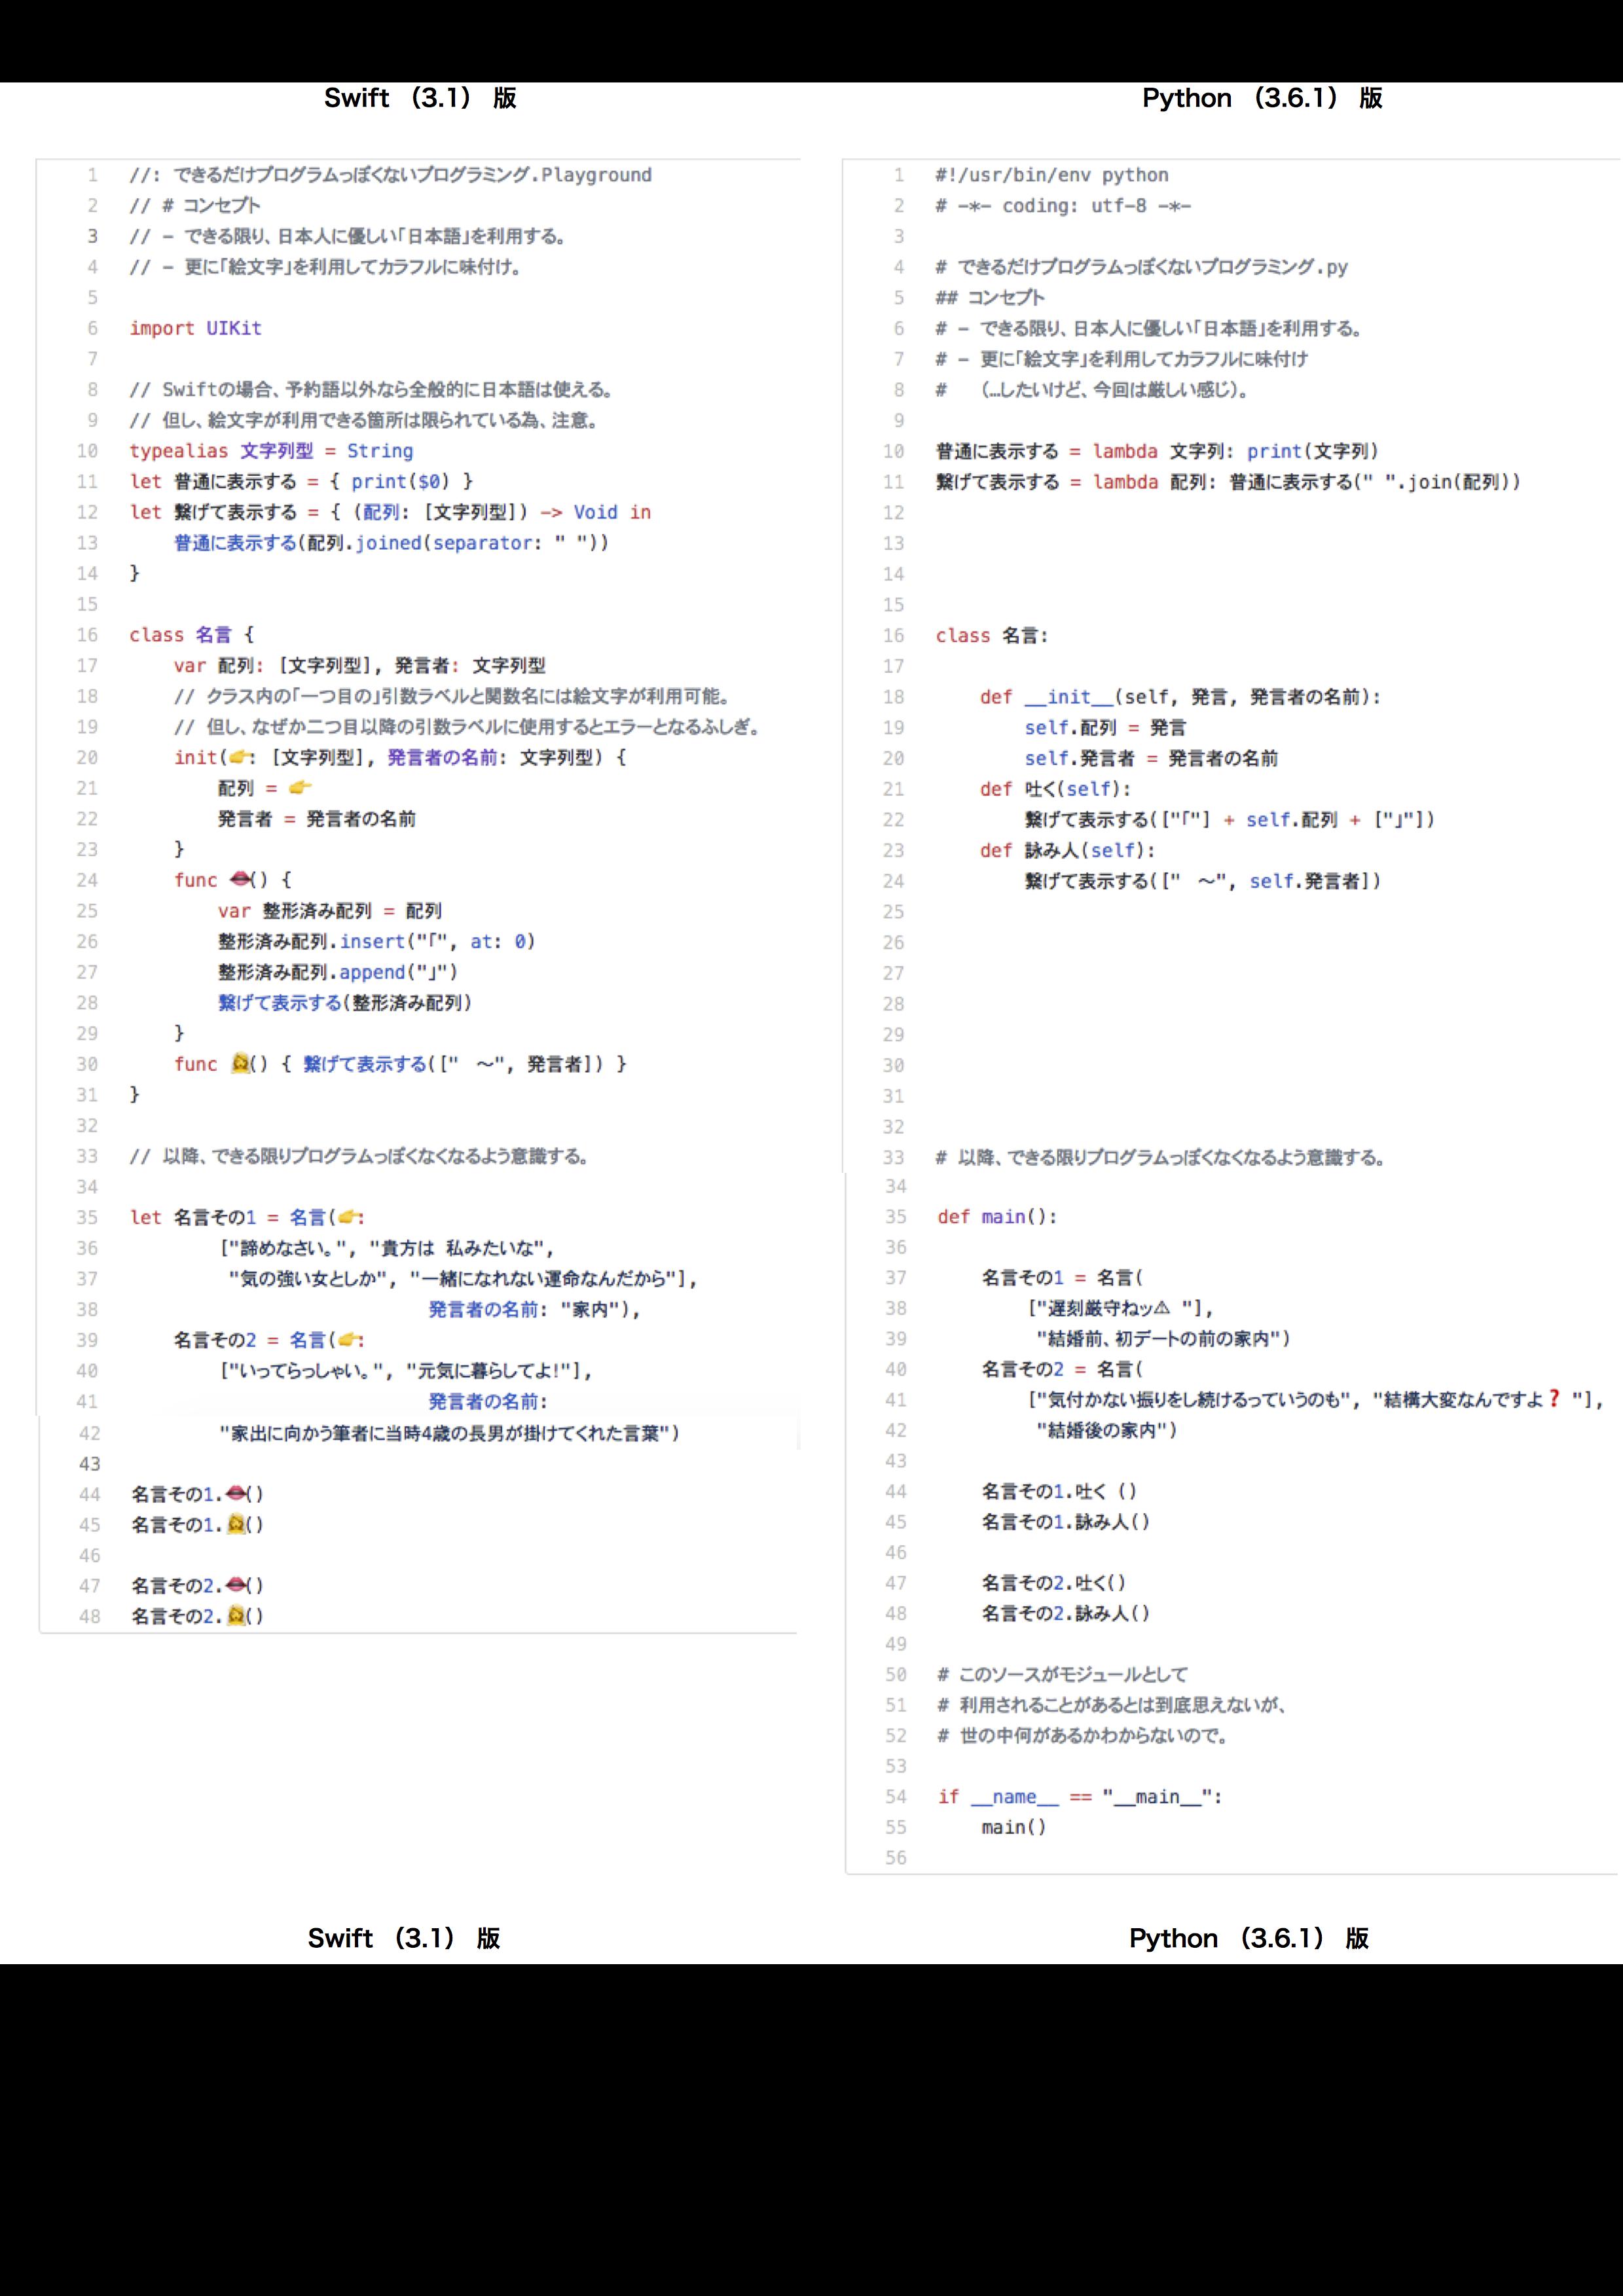 SwiftVSPython3.6.png